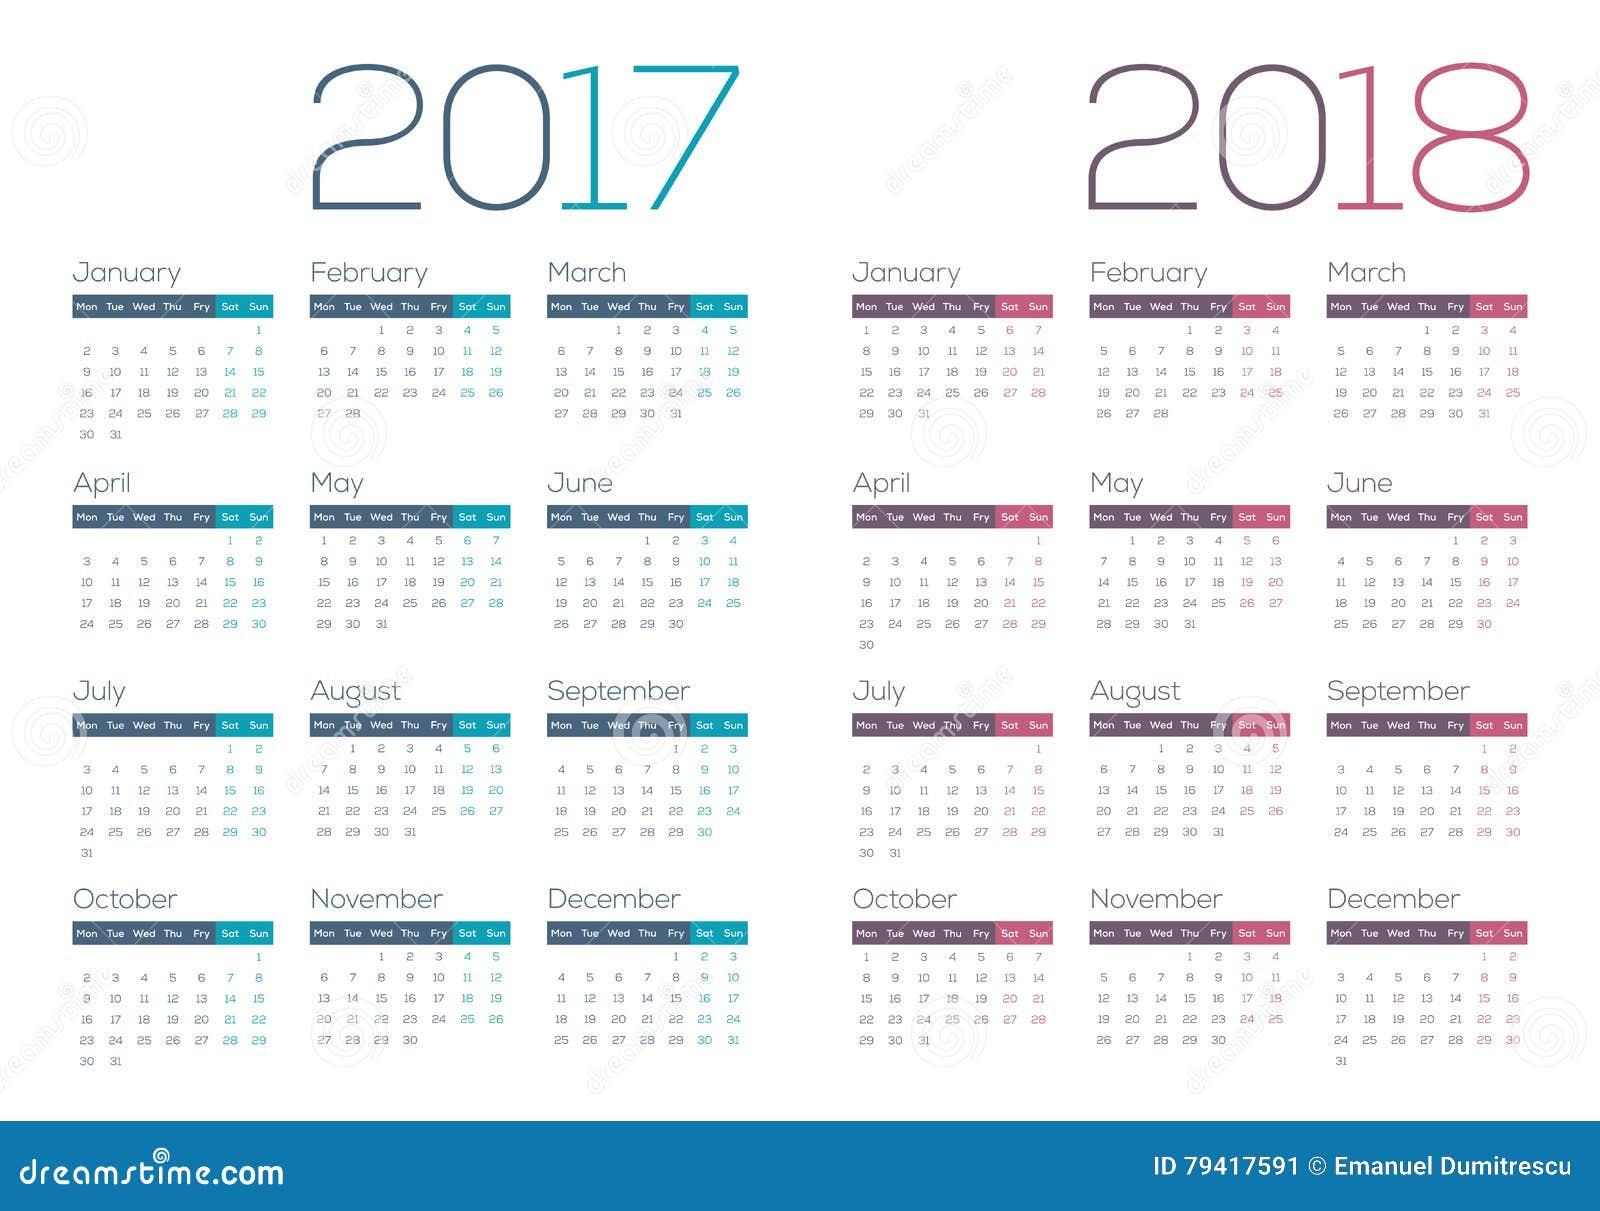 Календарь 2017-2018 года по неделям